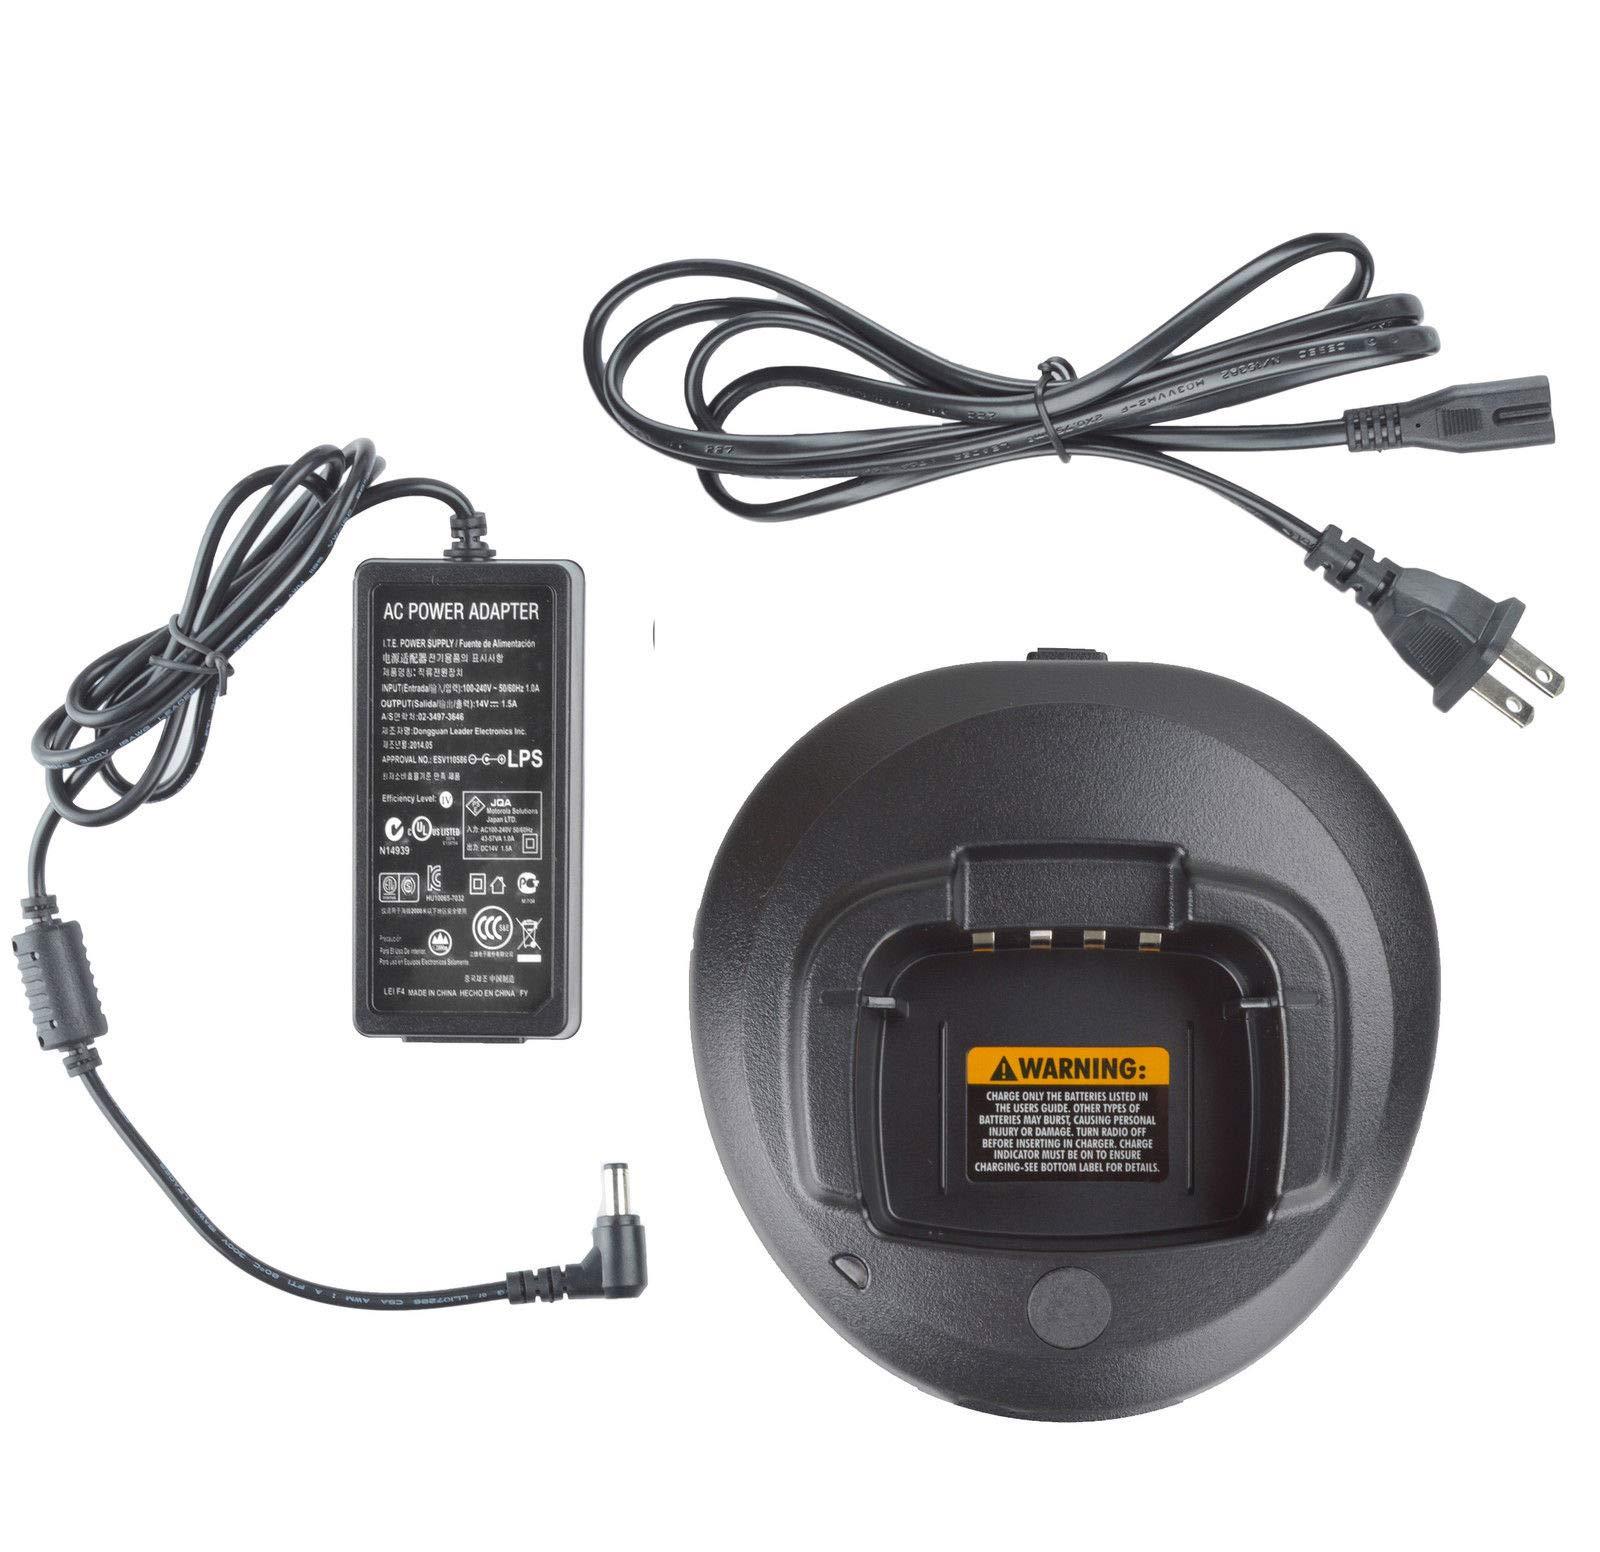 BLVL PMLN5228 Rapid Charger Set for Motorola CP1660 CP1600 CP1300 CP185 CP180 CP160 CP145 CP140 Radio